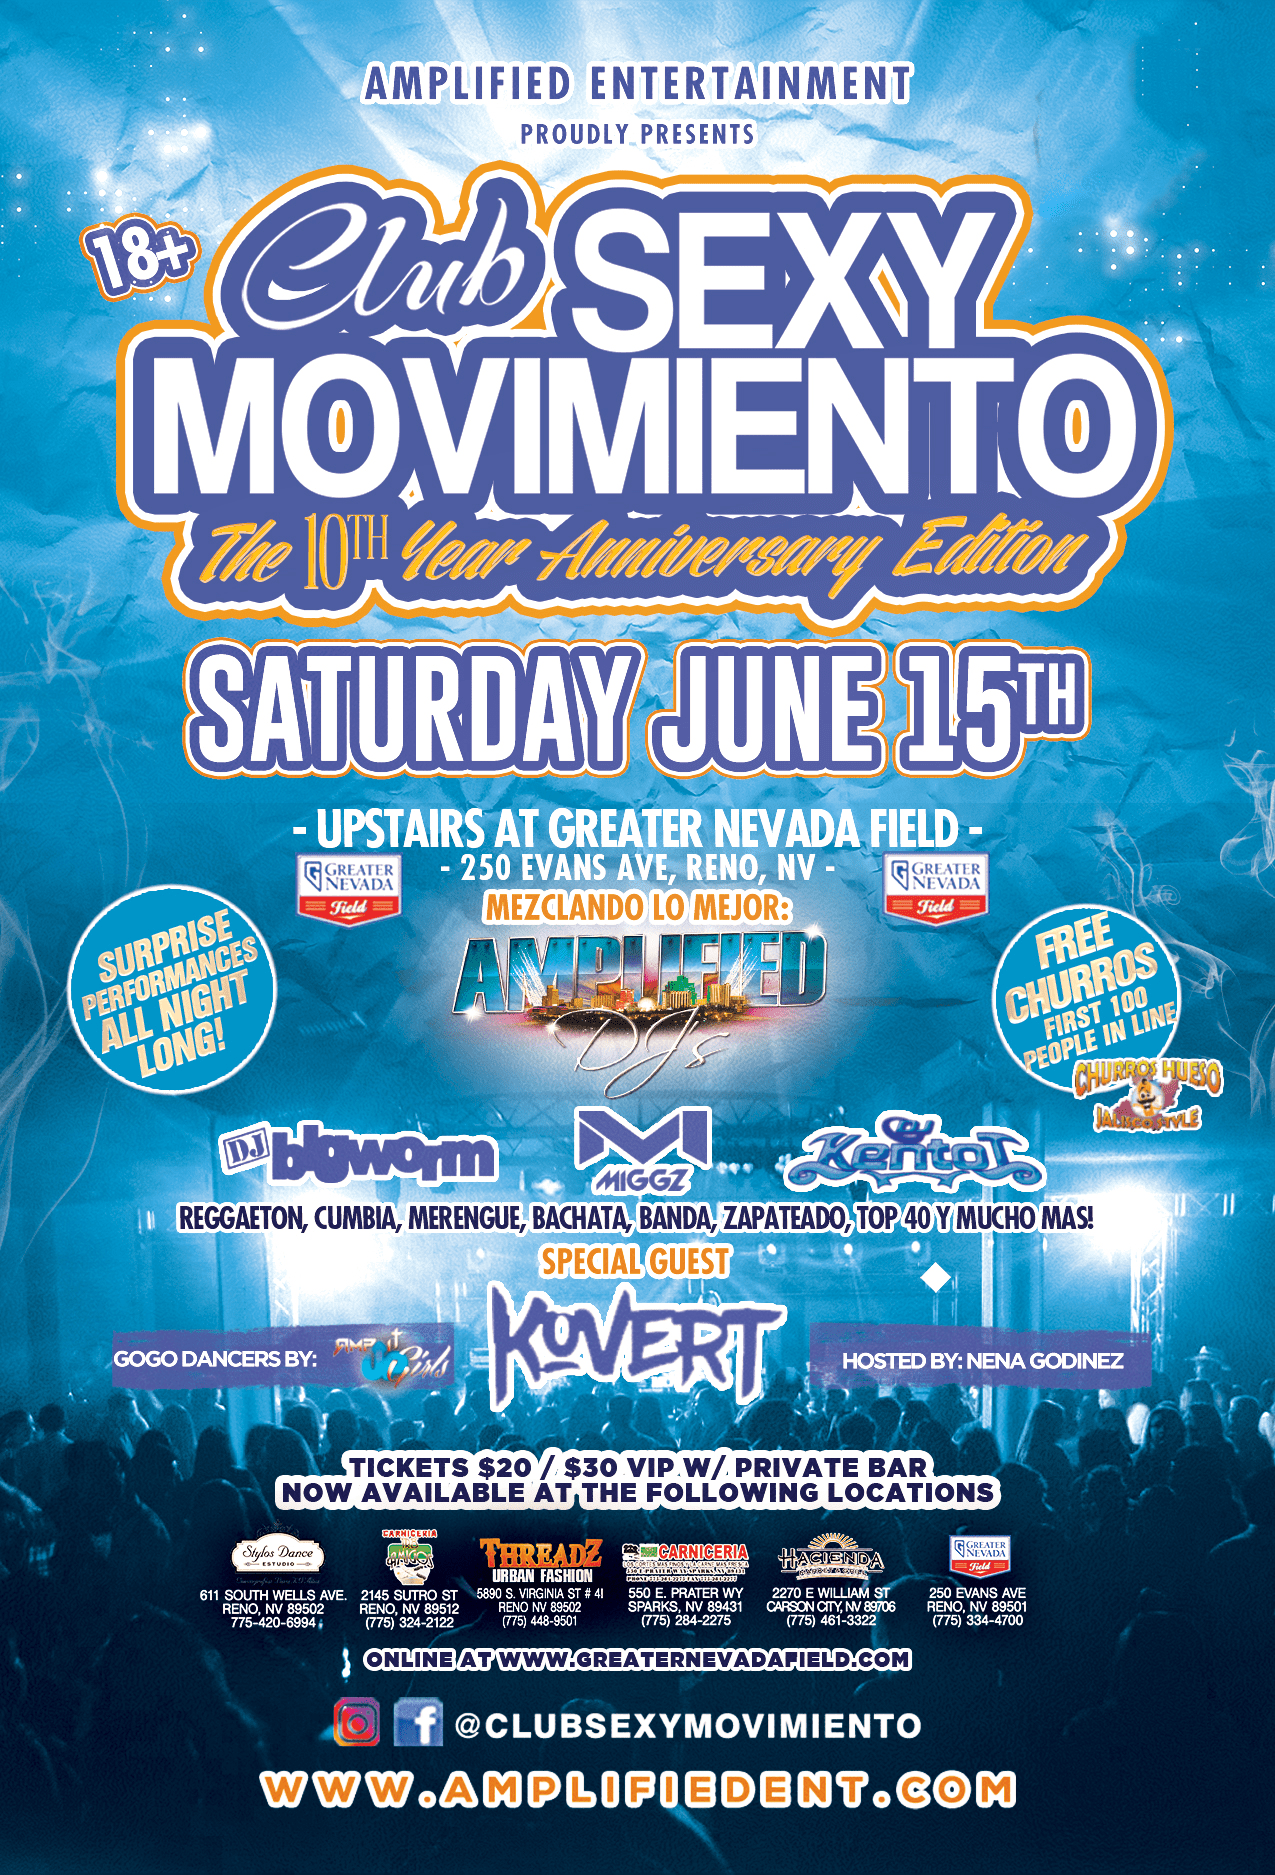 Club Sexy Movimiento | The River 103 7 | Reno Media Group, LLC